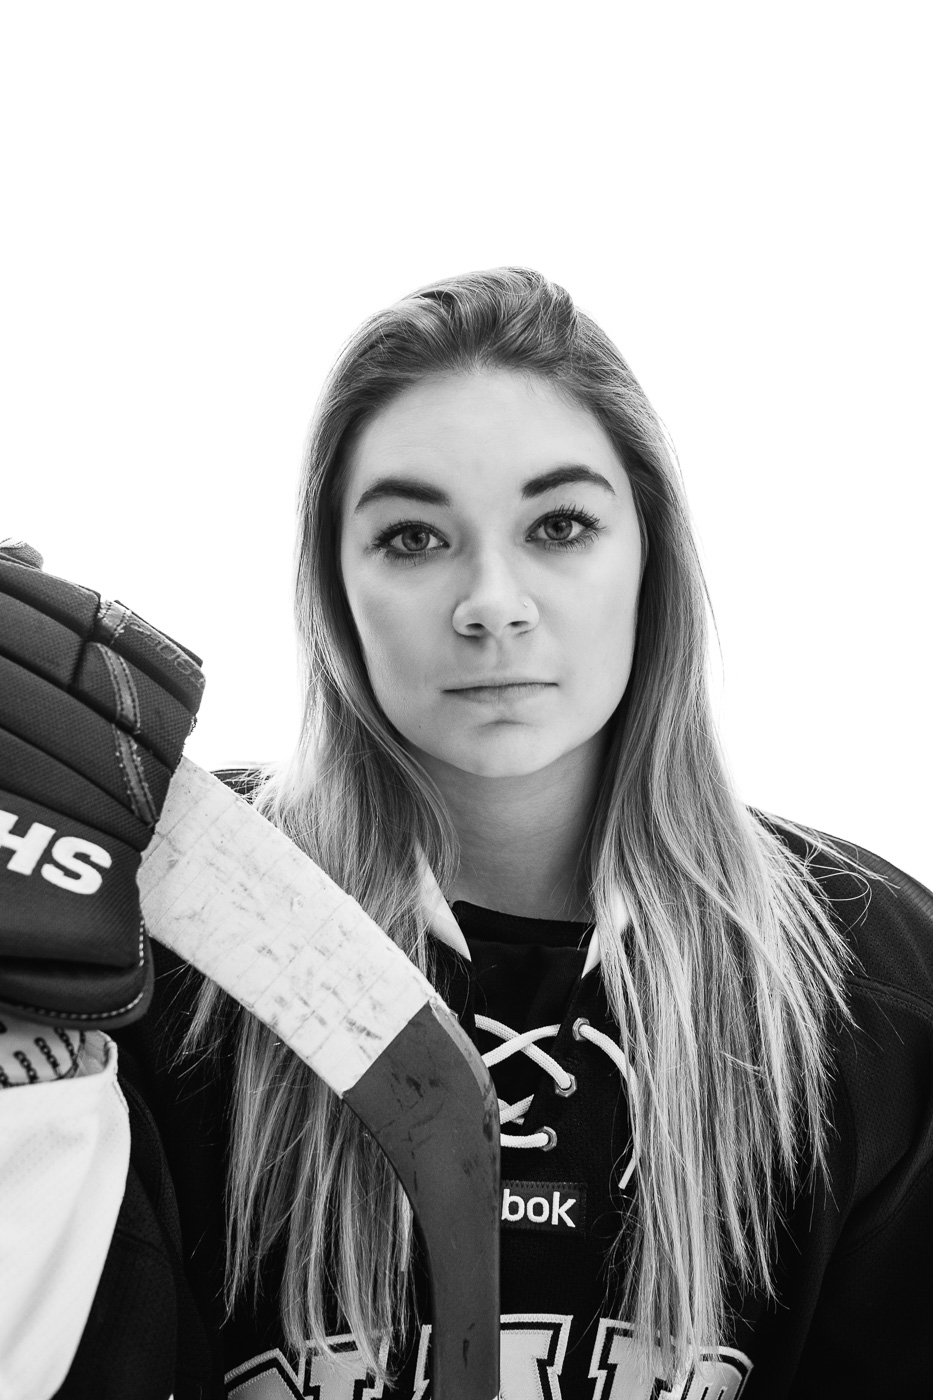 NAIT-Womens-Hockey-Student-Athlete-Portrait-black-and-white-20151207-_O6A8703-Edit-Web.jpg